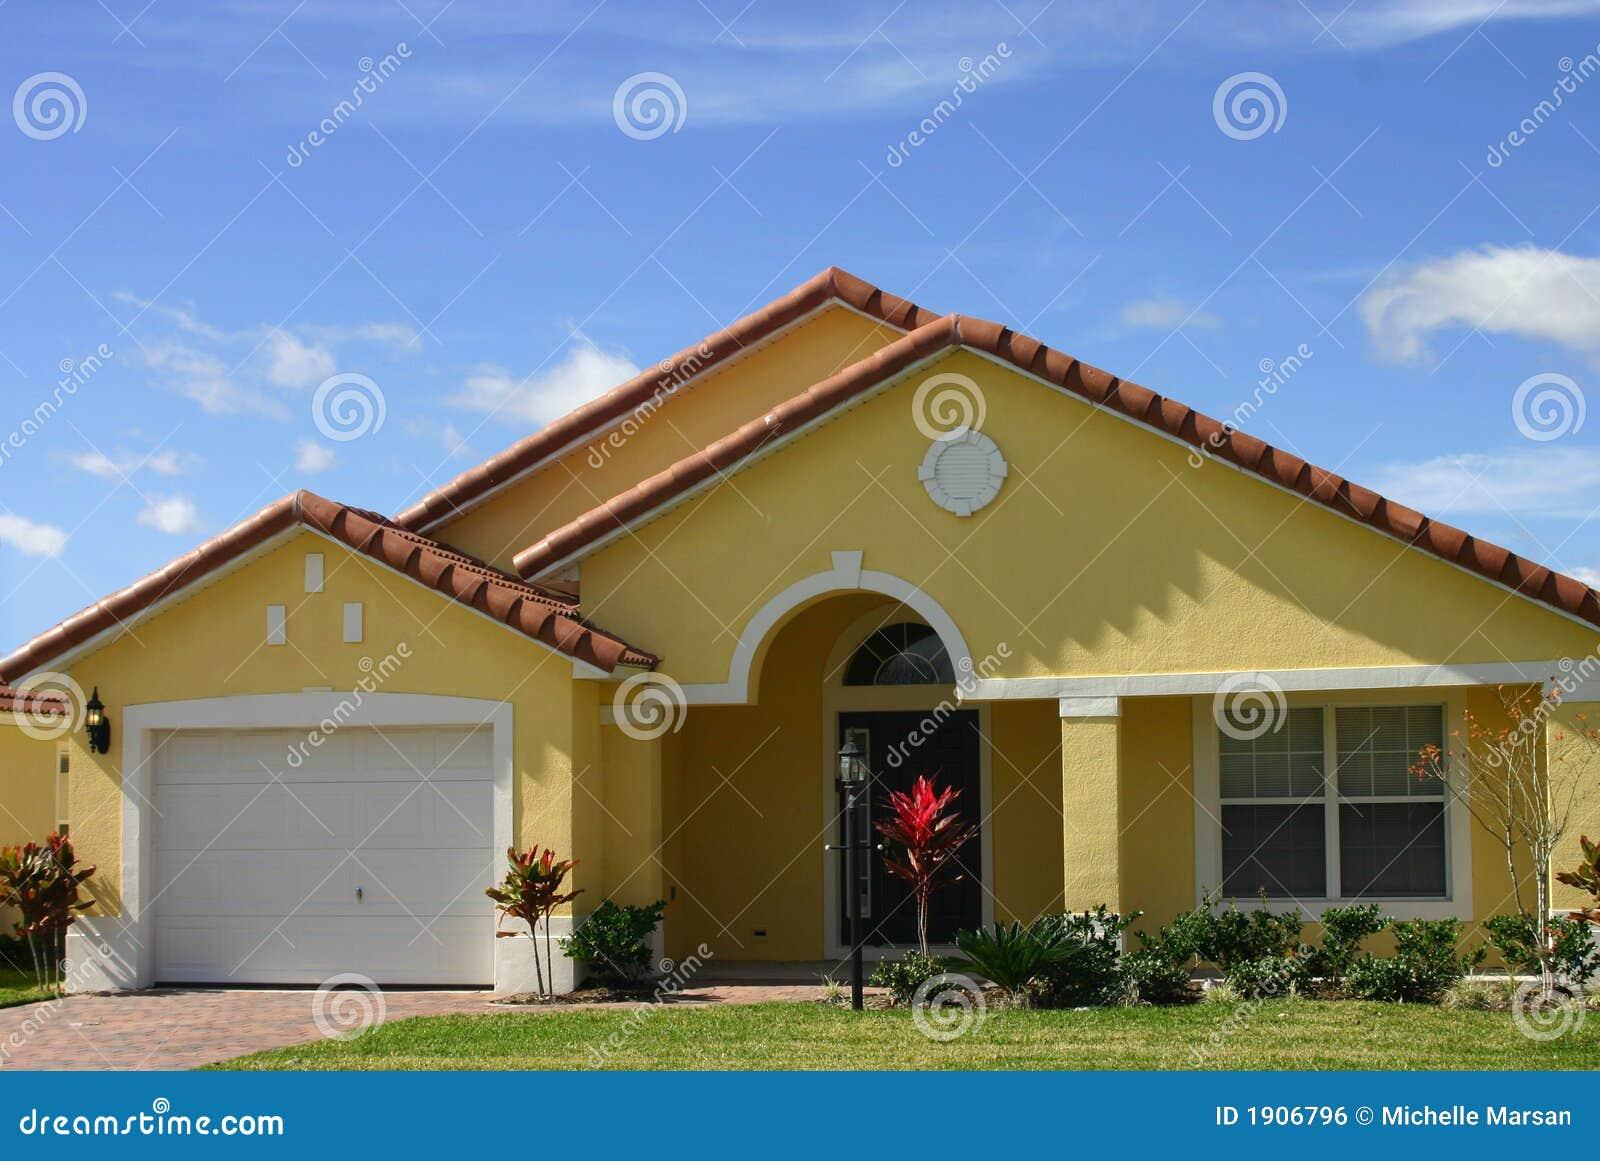 Yellow dream home